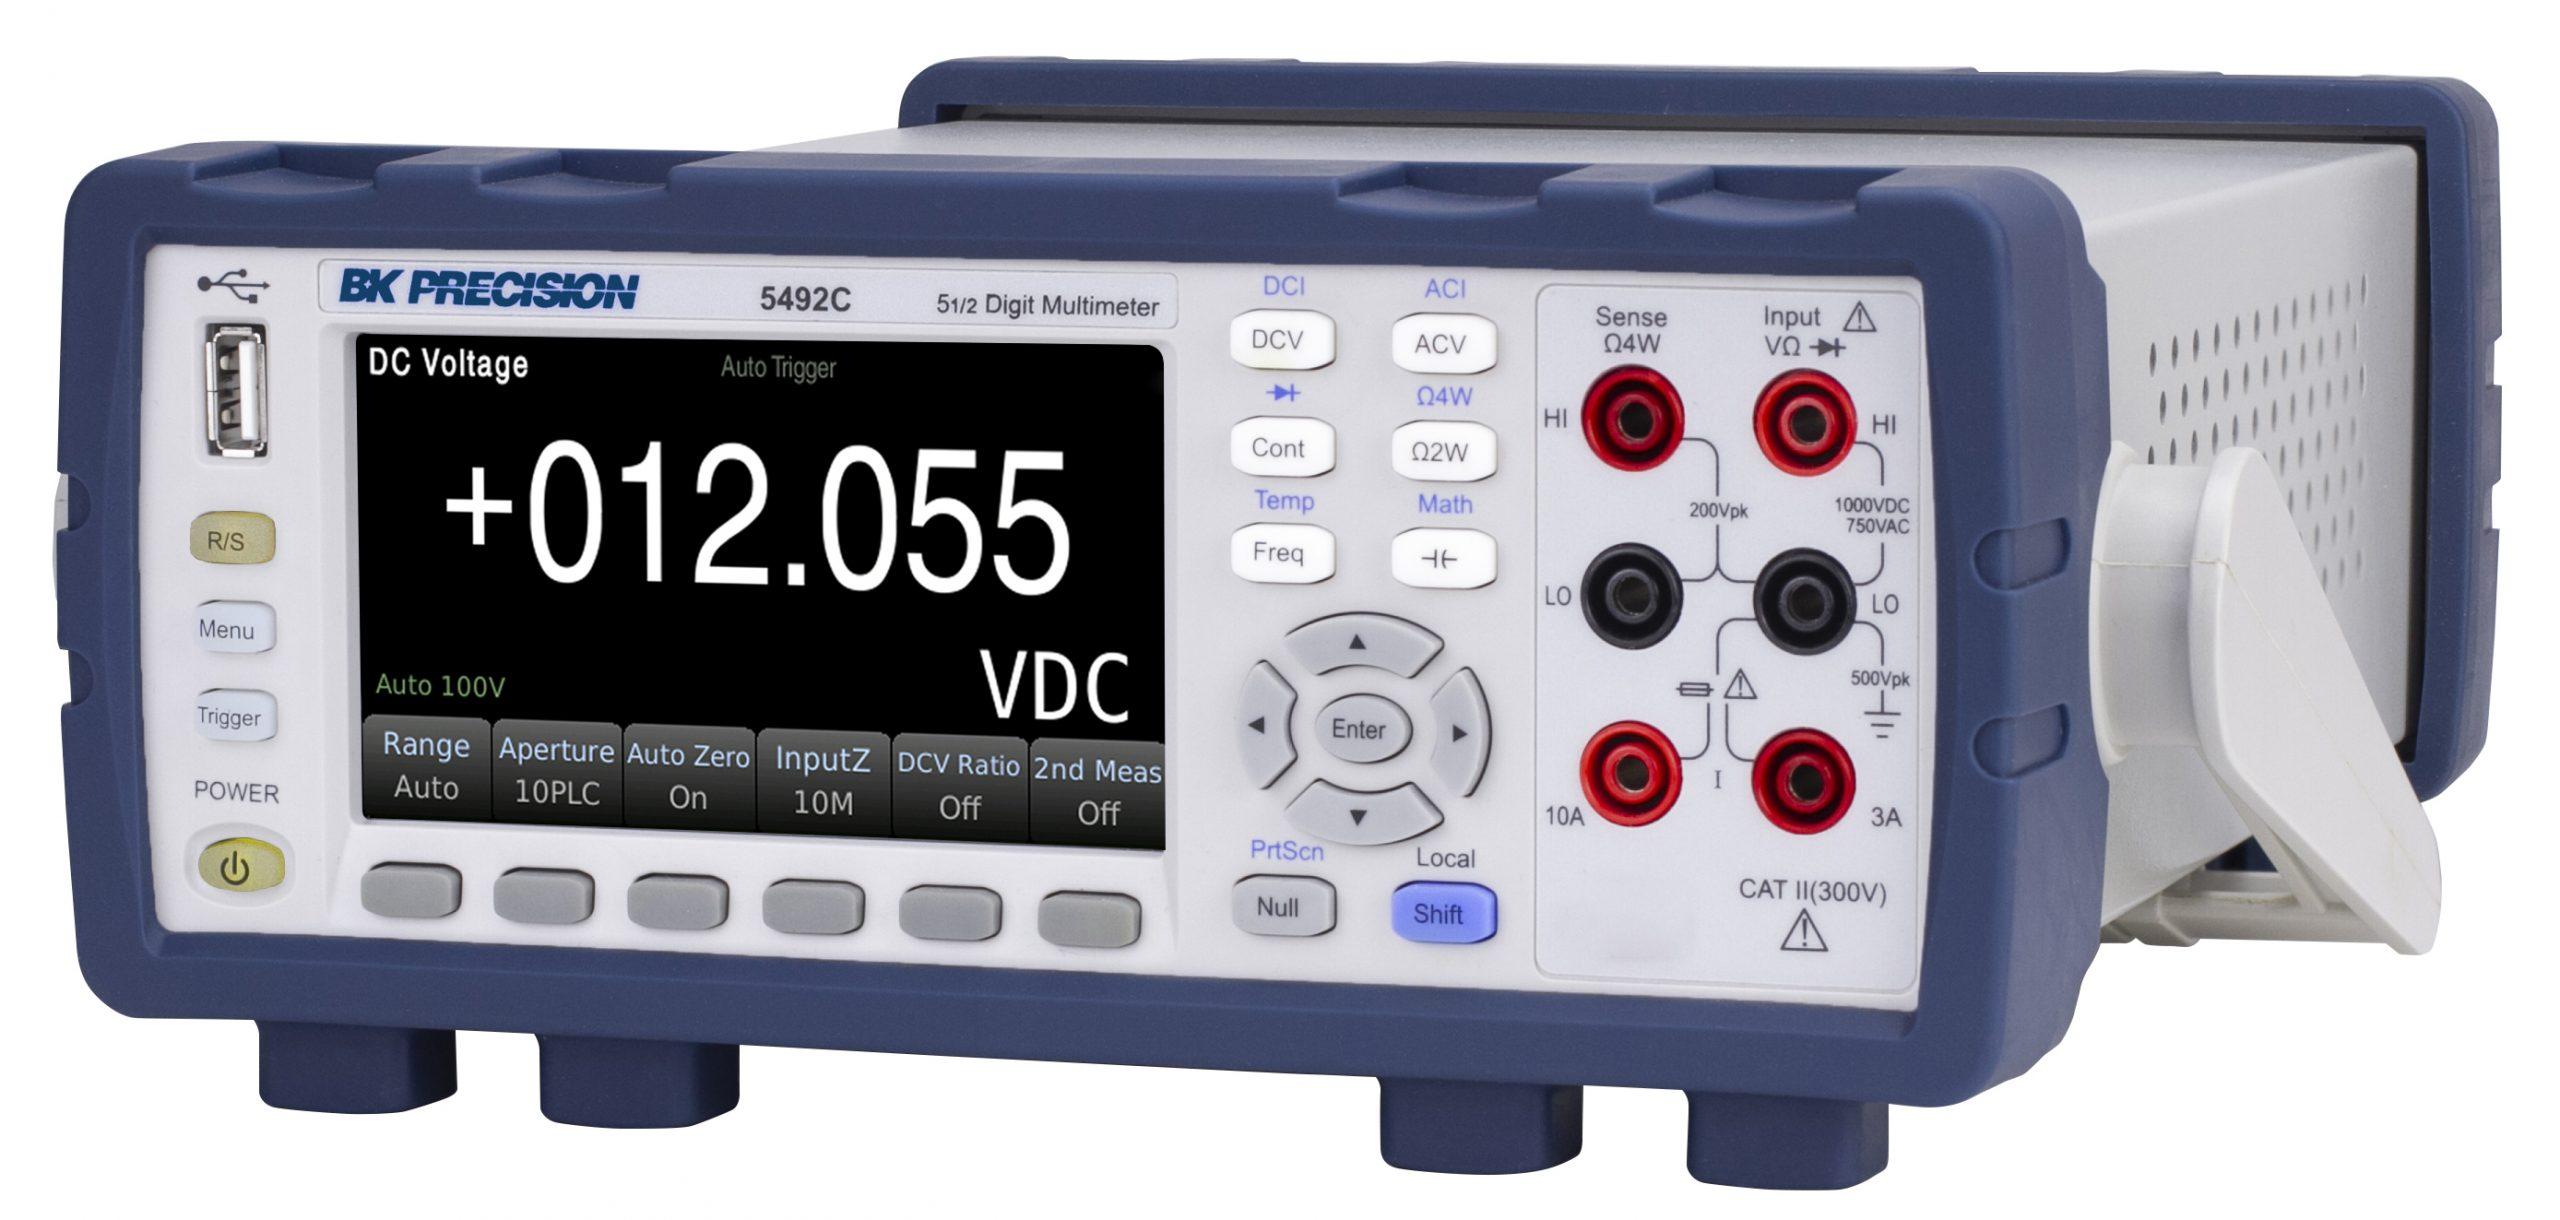 B&K Precision 5492C Digital Benchtop Multimeter, 5.5 Digit